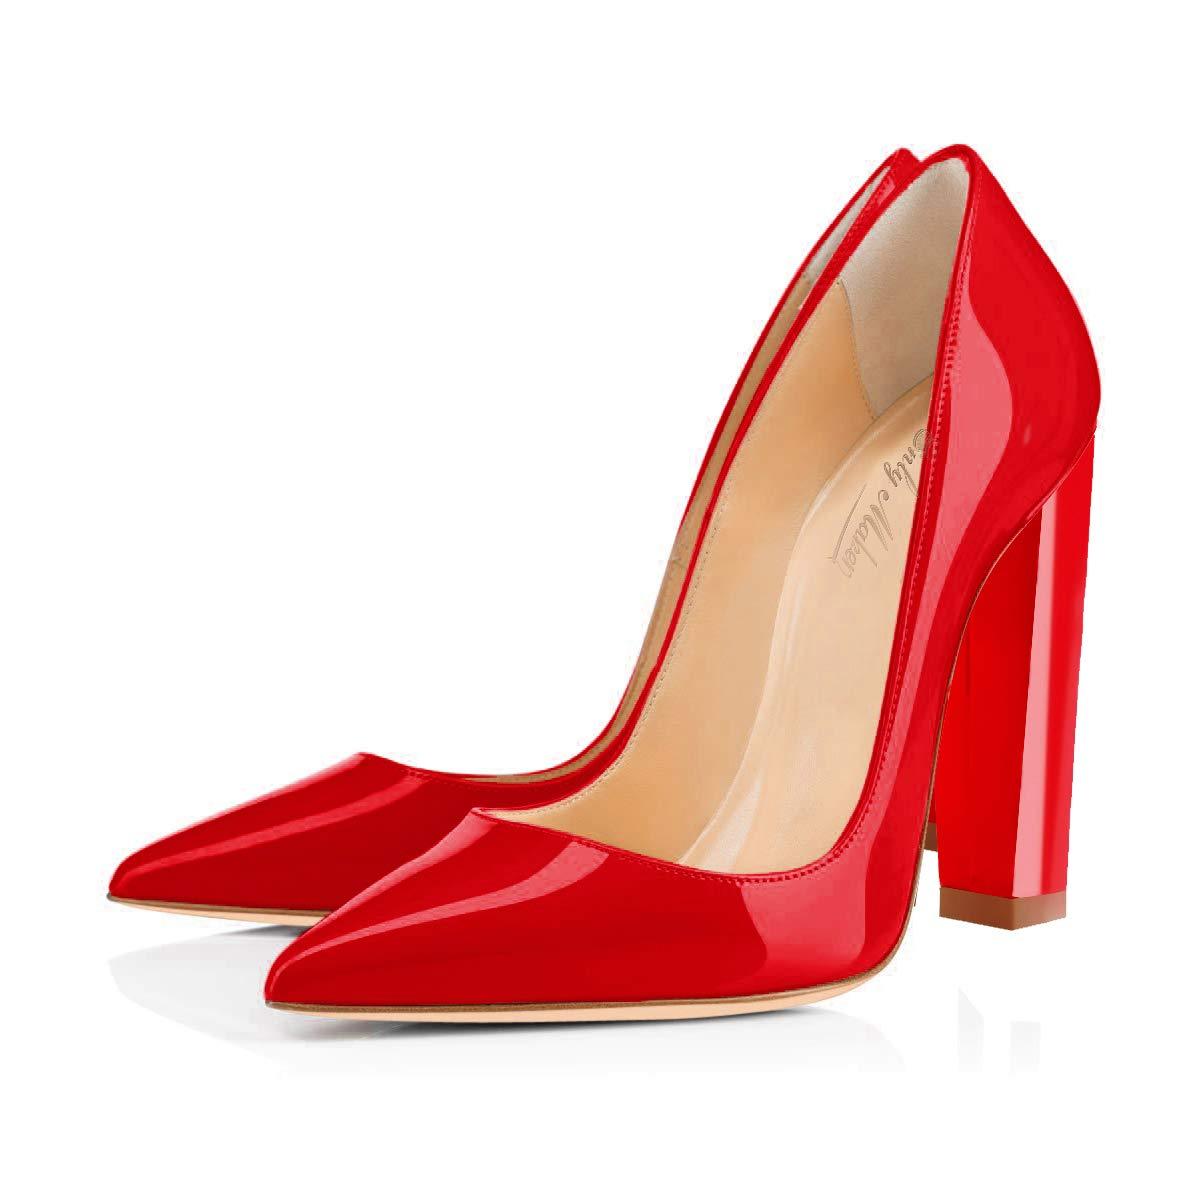 475c56439fdb3b Onlymaker Frauen wies Zehe Block Chunky Klassische High Heels Slip On Schuhe  Hochzeit Büro Party Pumps  Amazon.de  Schuhe   Handtaschen